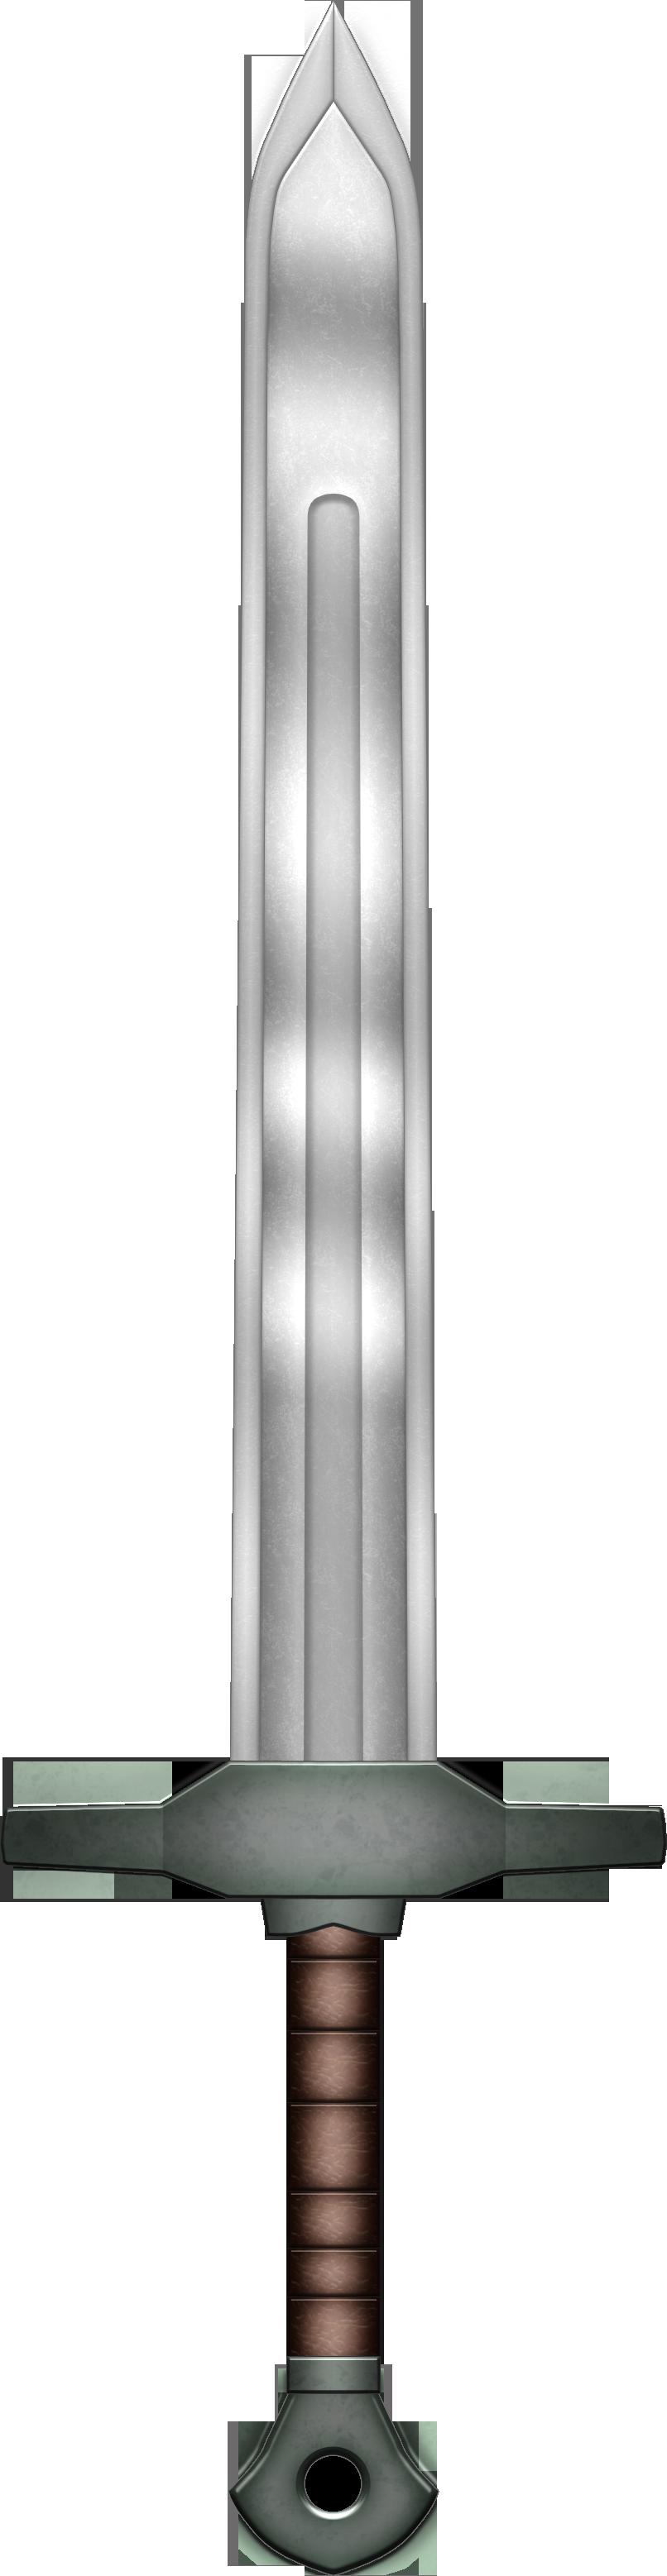 TP Ordon Sword by BLUEamnesiac